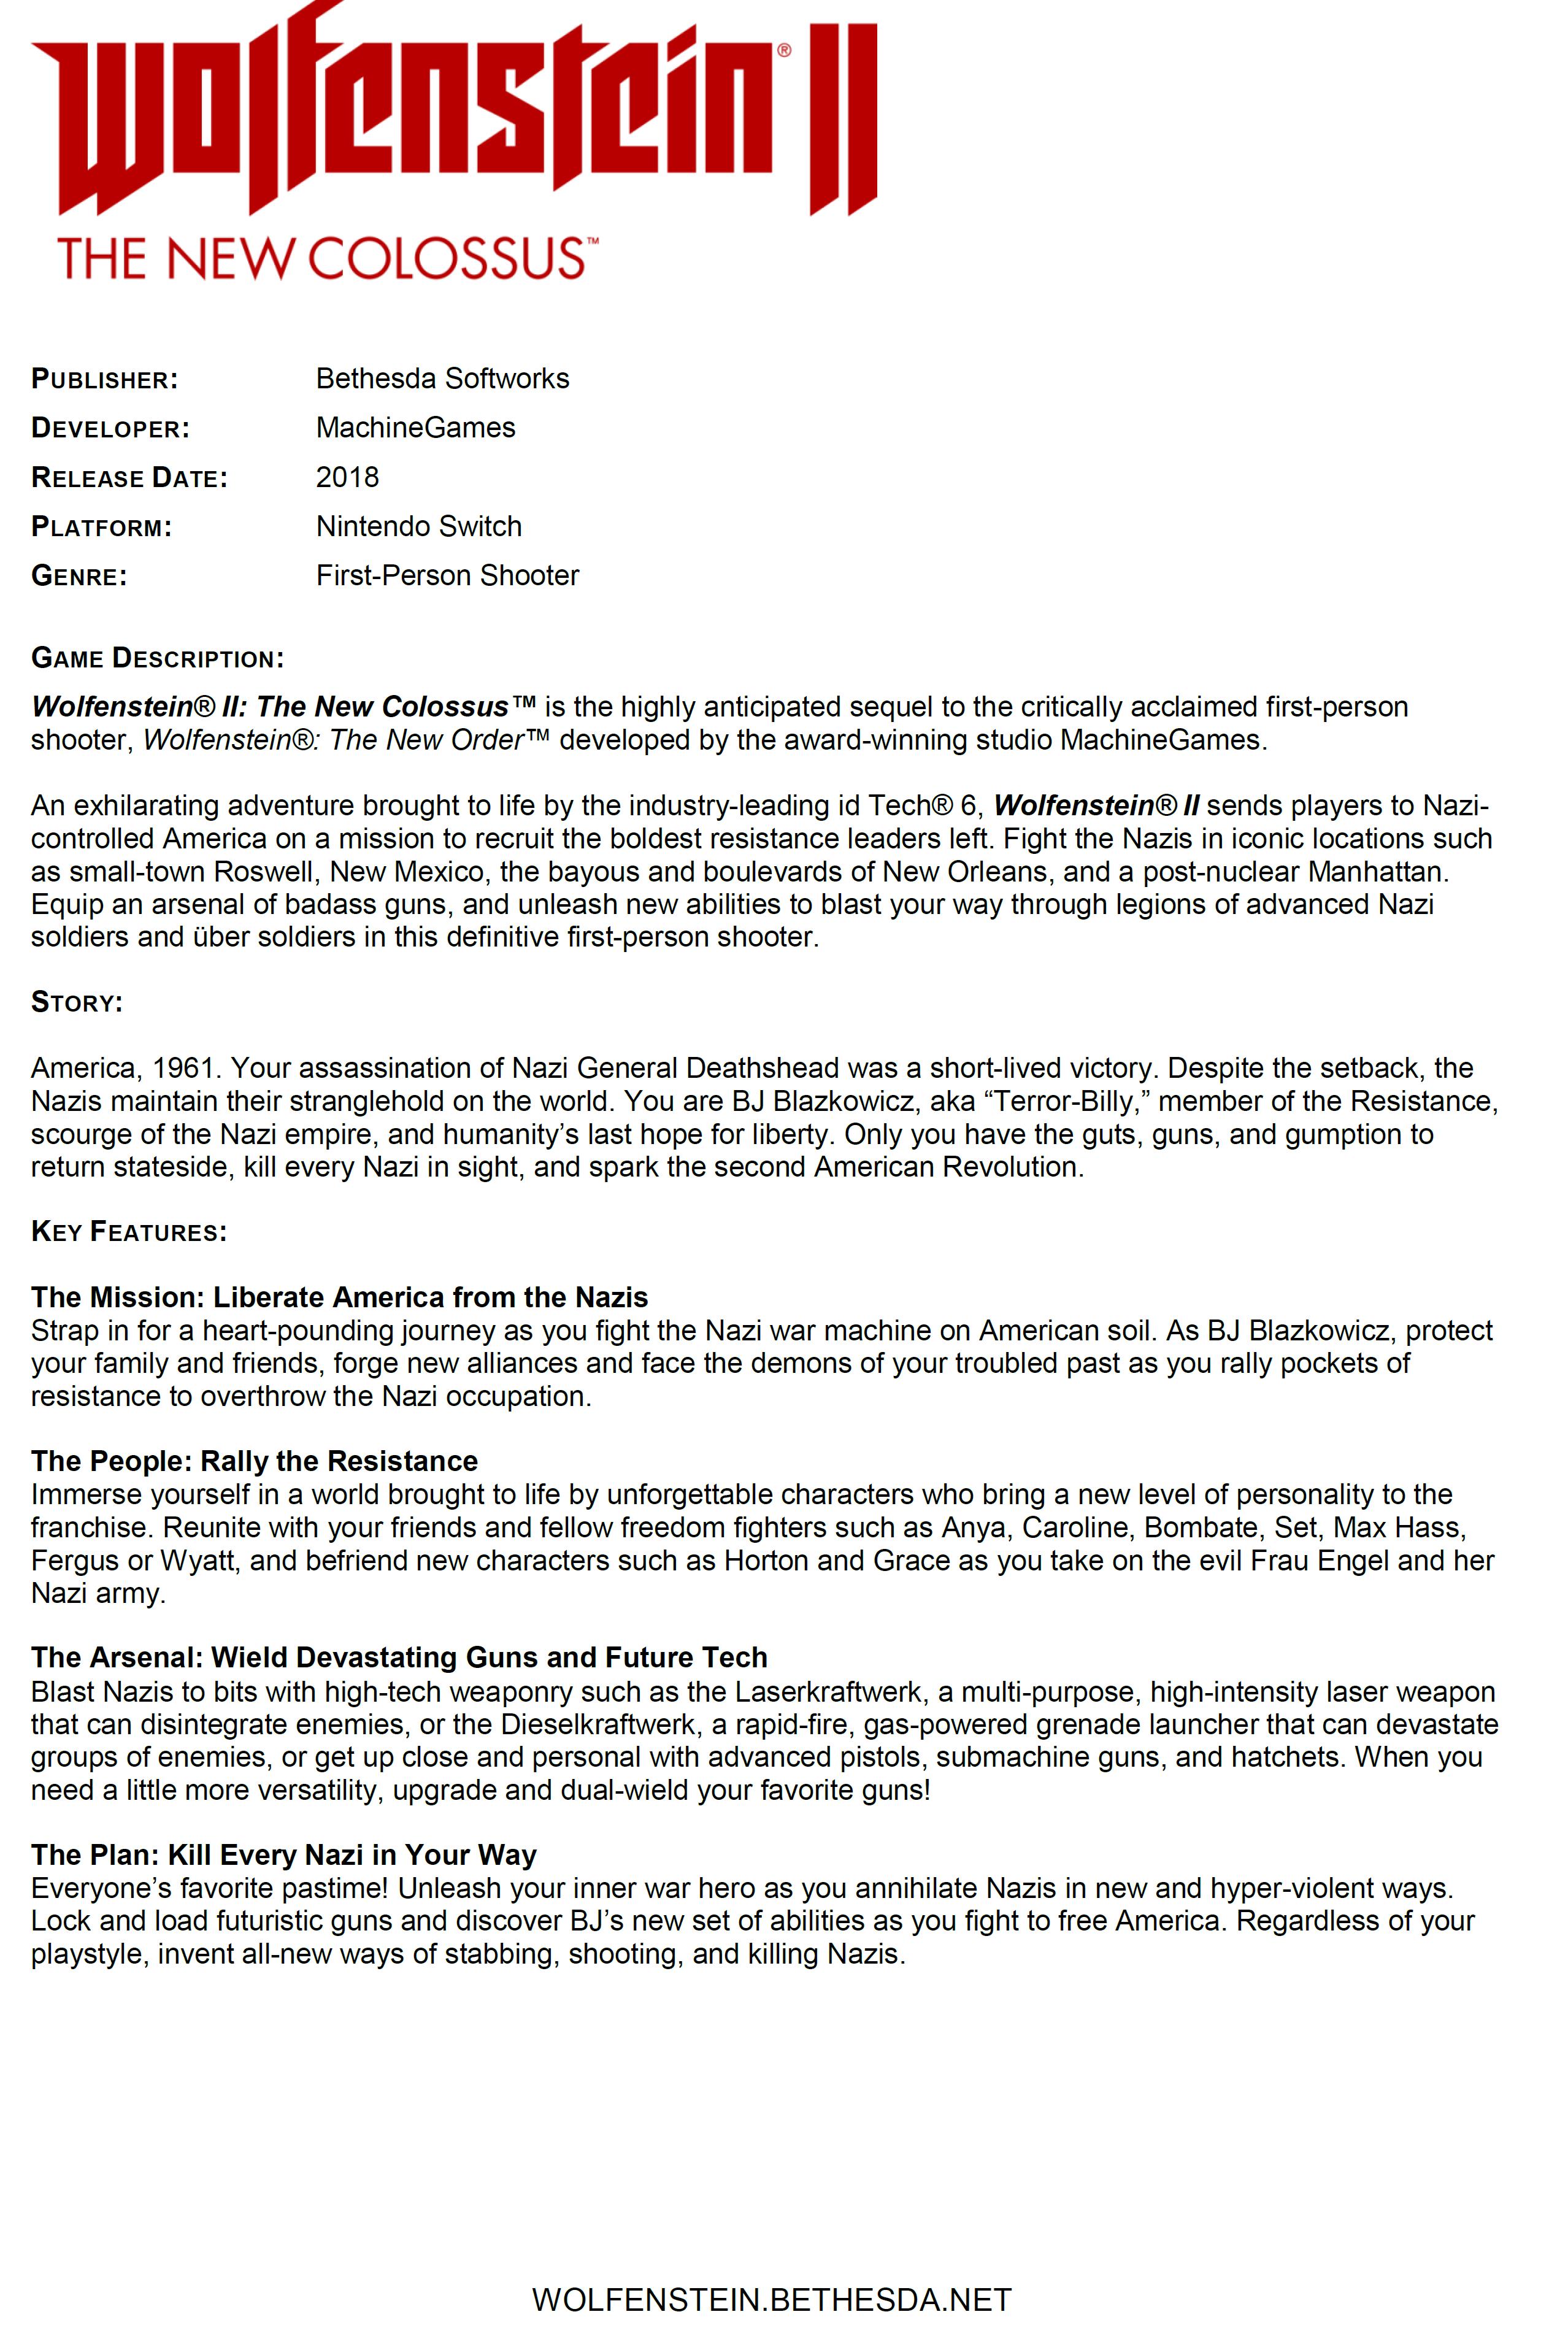 wolfenstein-ii-fact-sheet.png